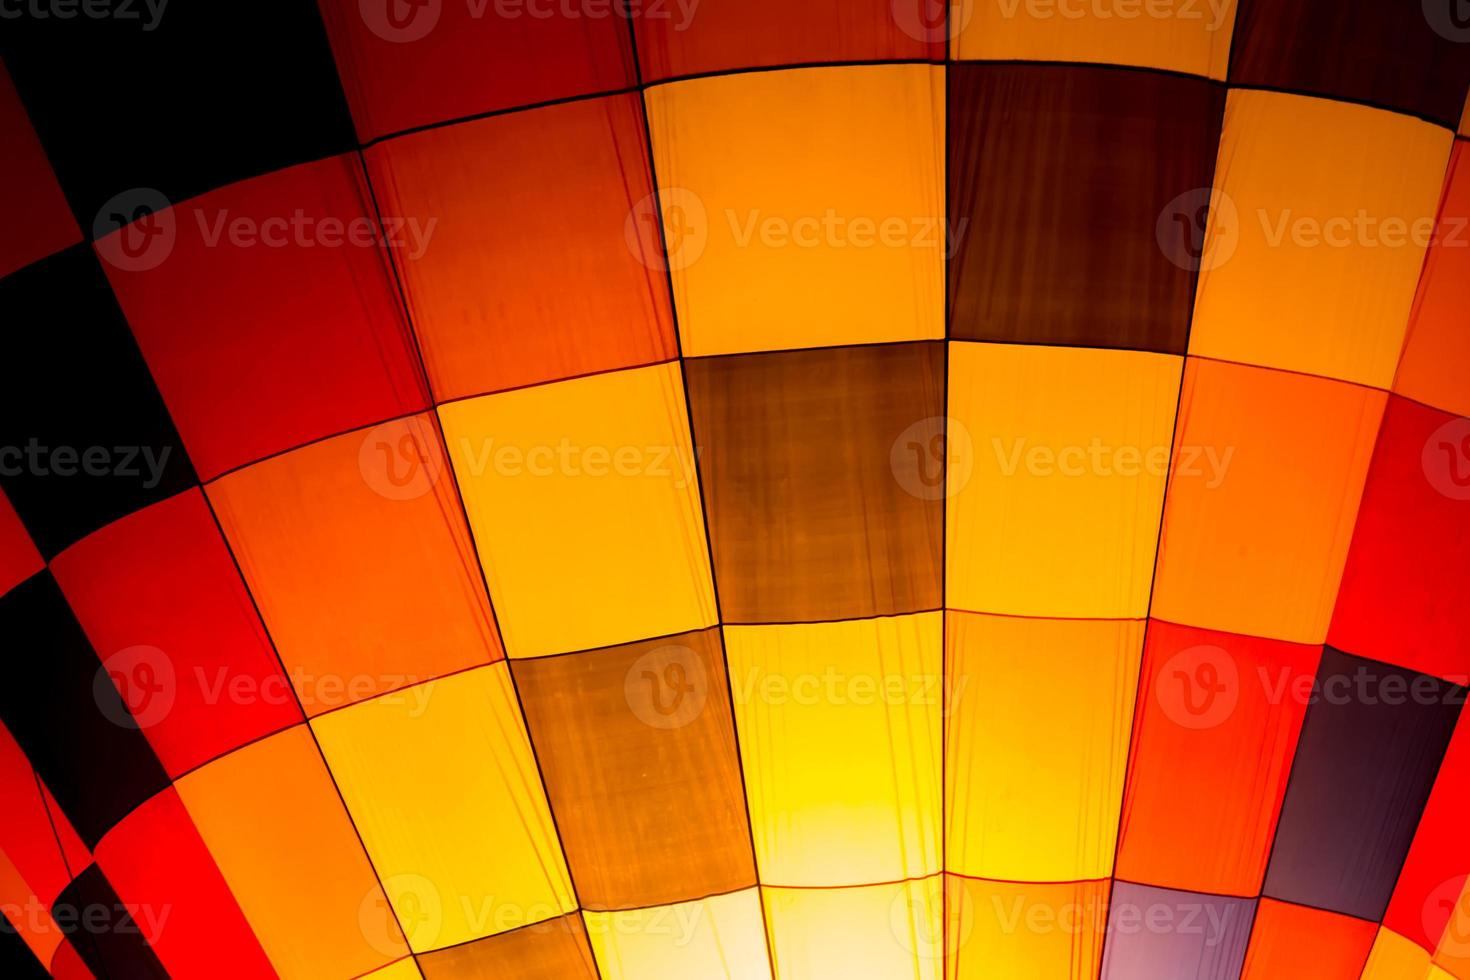 kleurrijke hete luchtballon foto